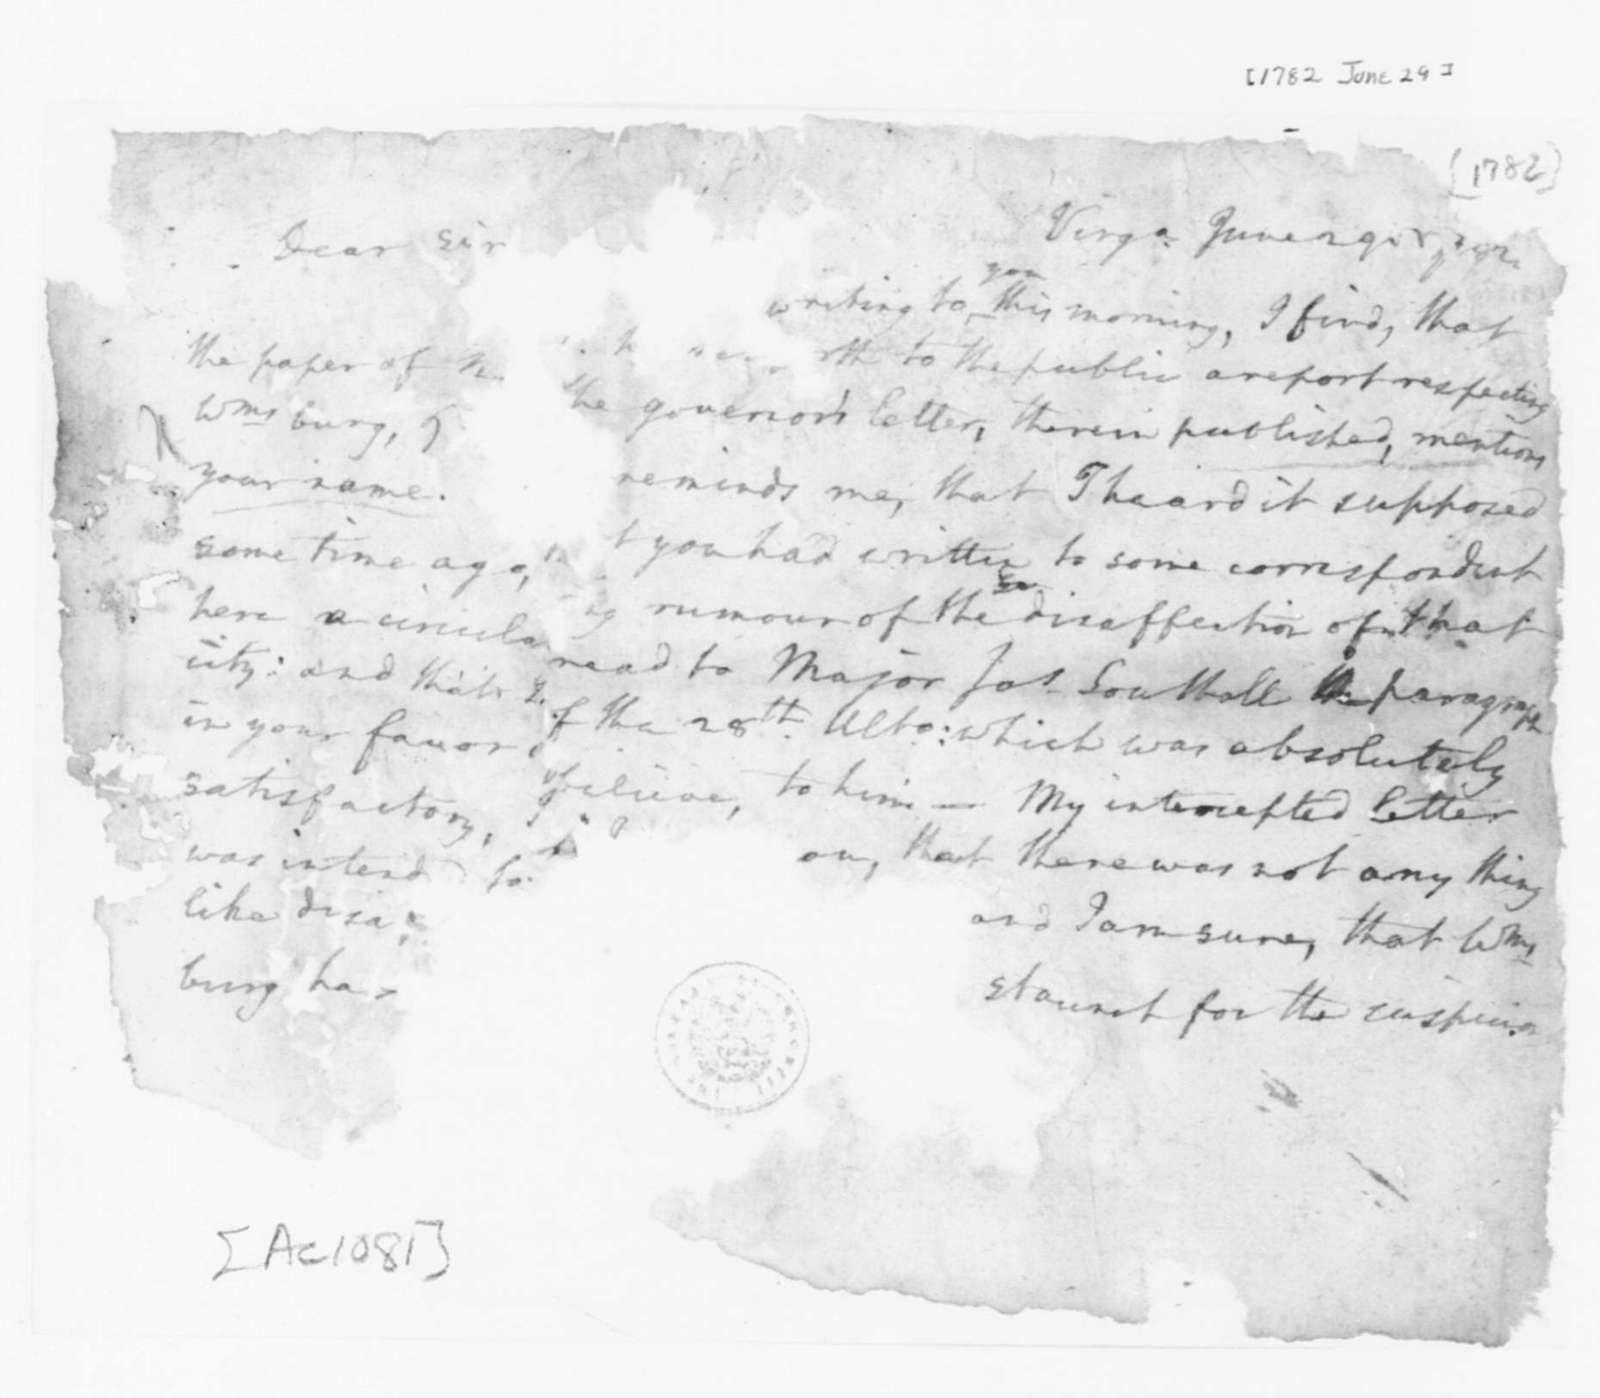 Edmund Randolph to James Madison, June 29, 1782. Fragment.